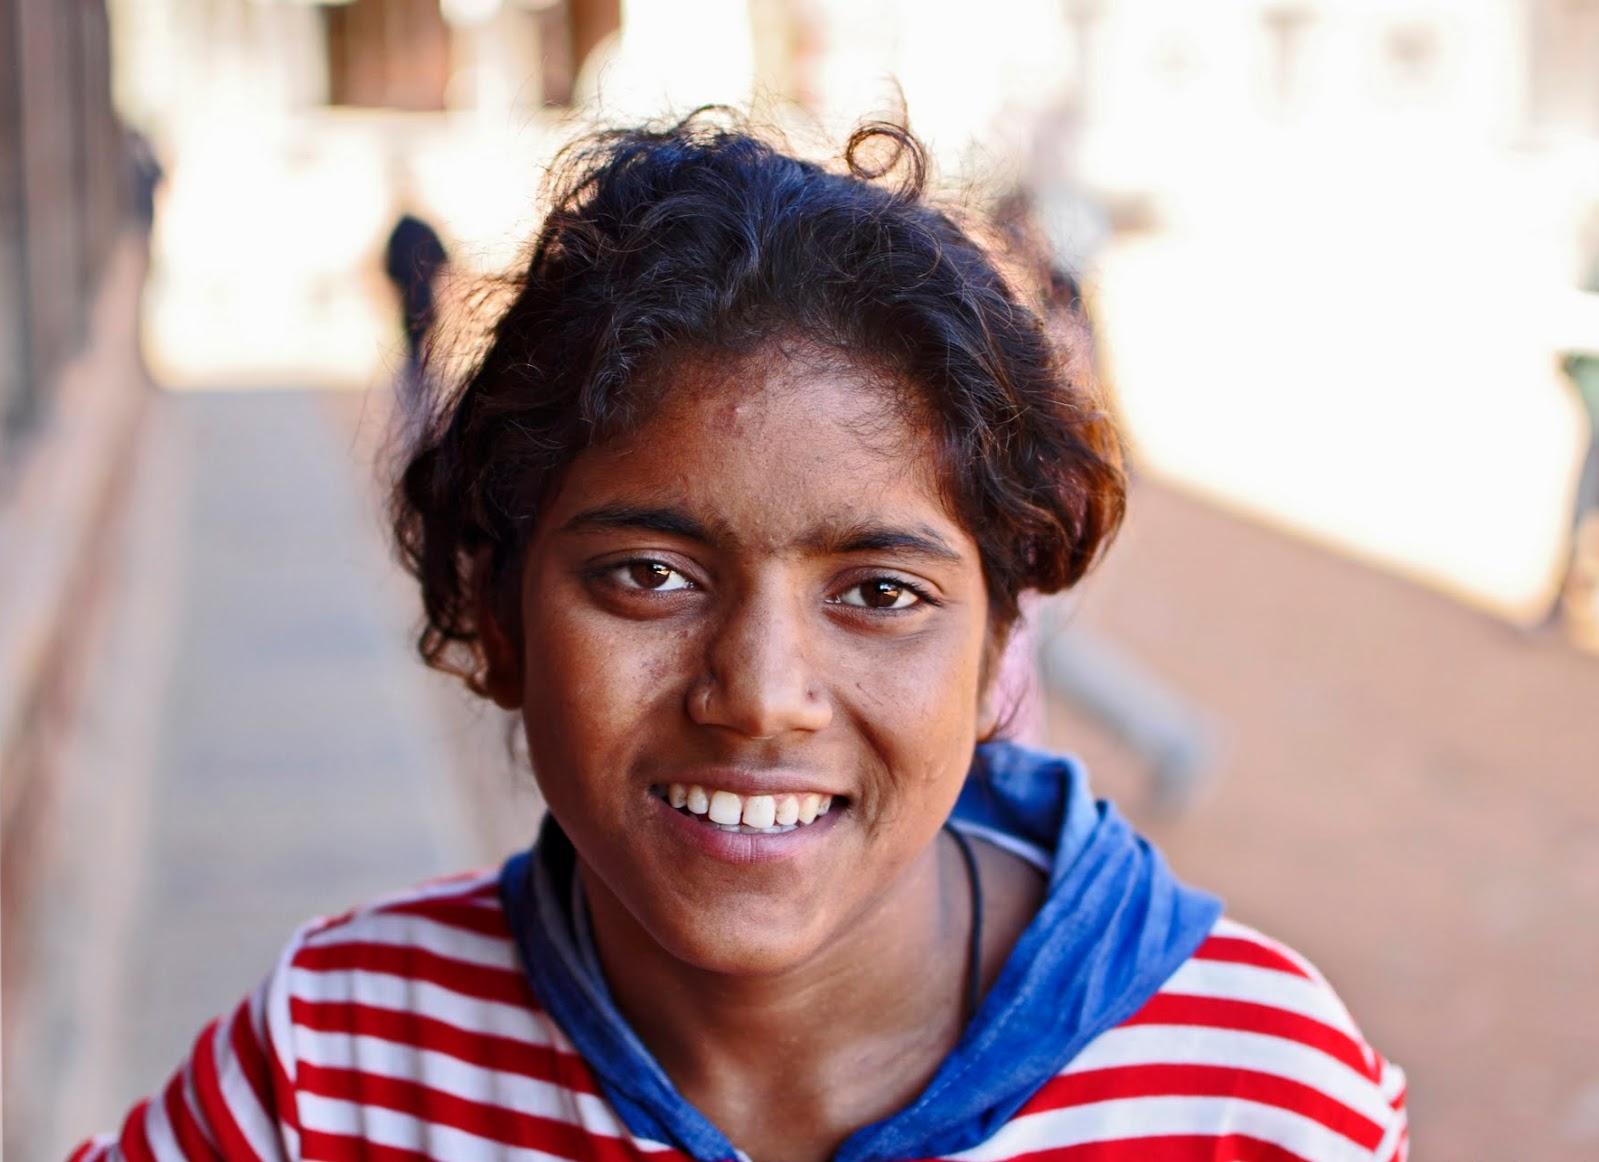 Humans of Bhaktapur